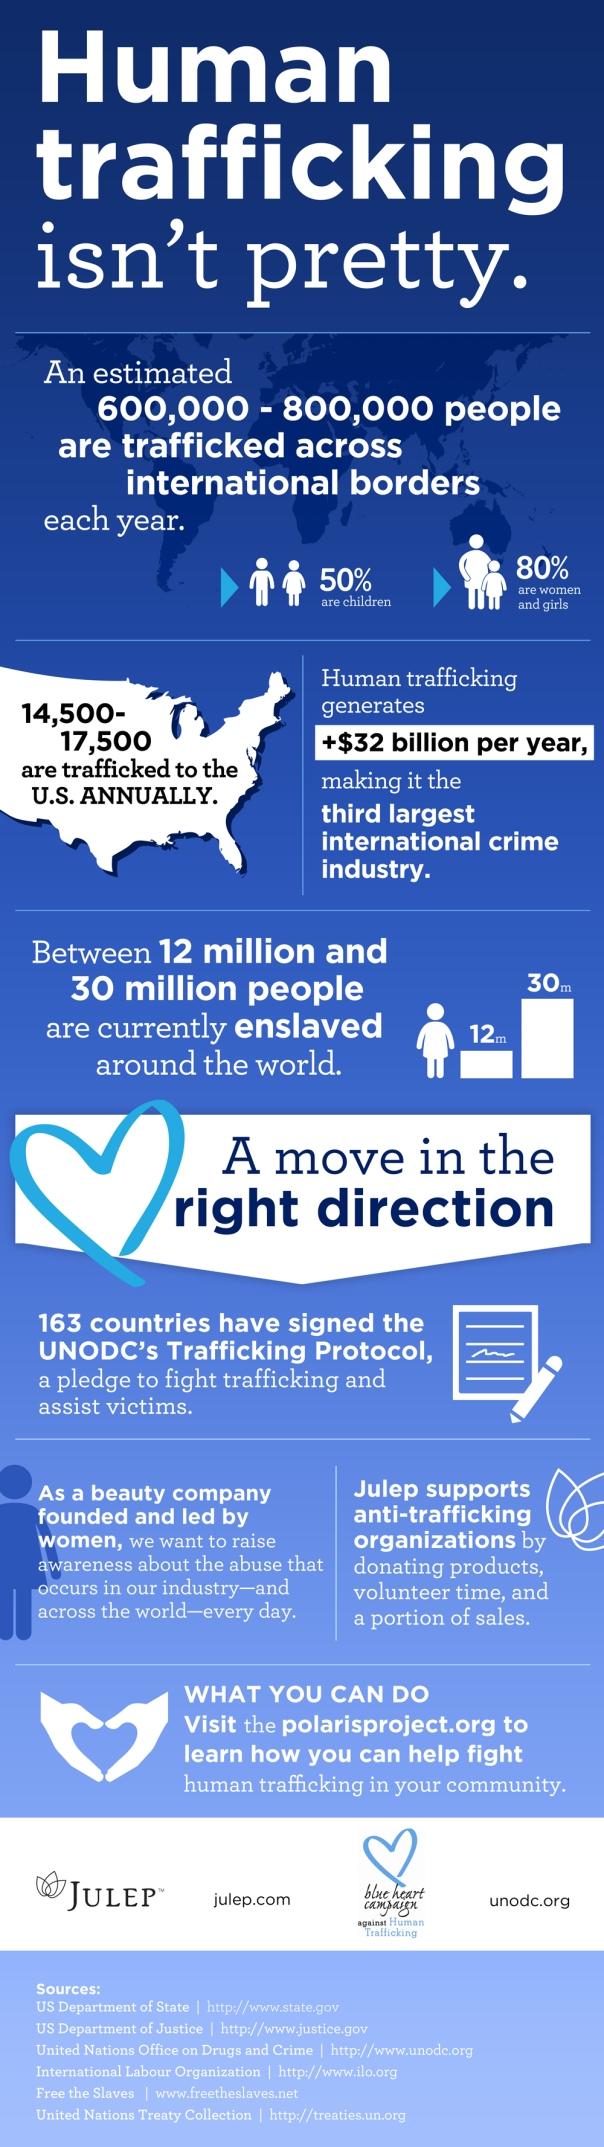 Julep_EdithSanford_Infographic_R2